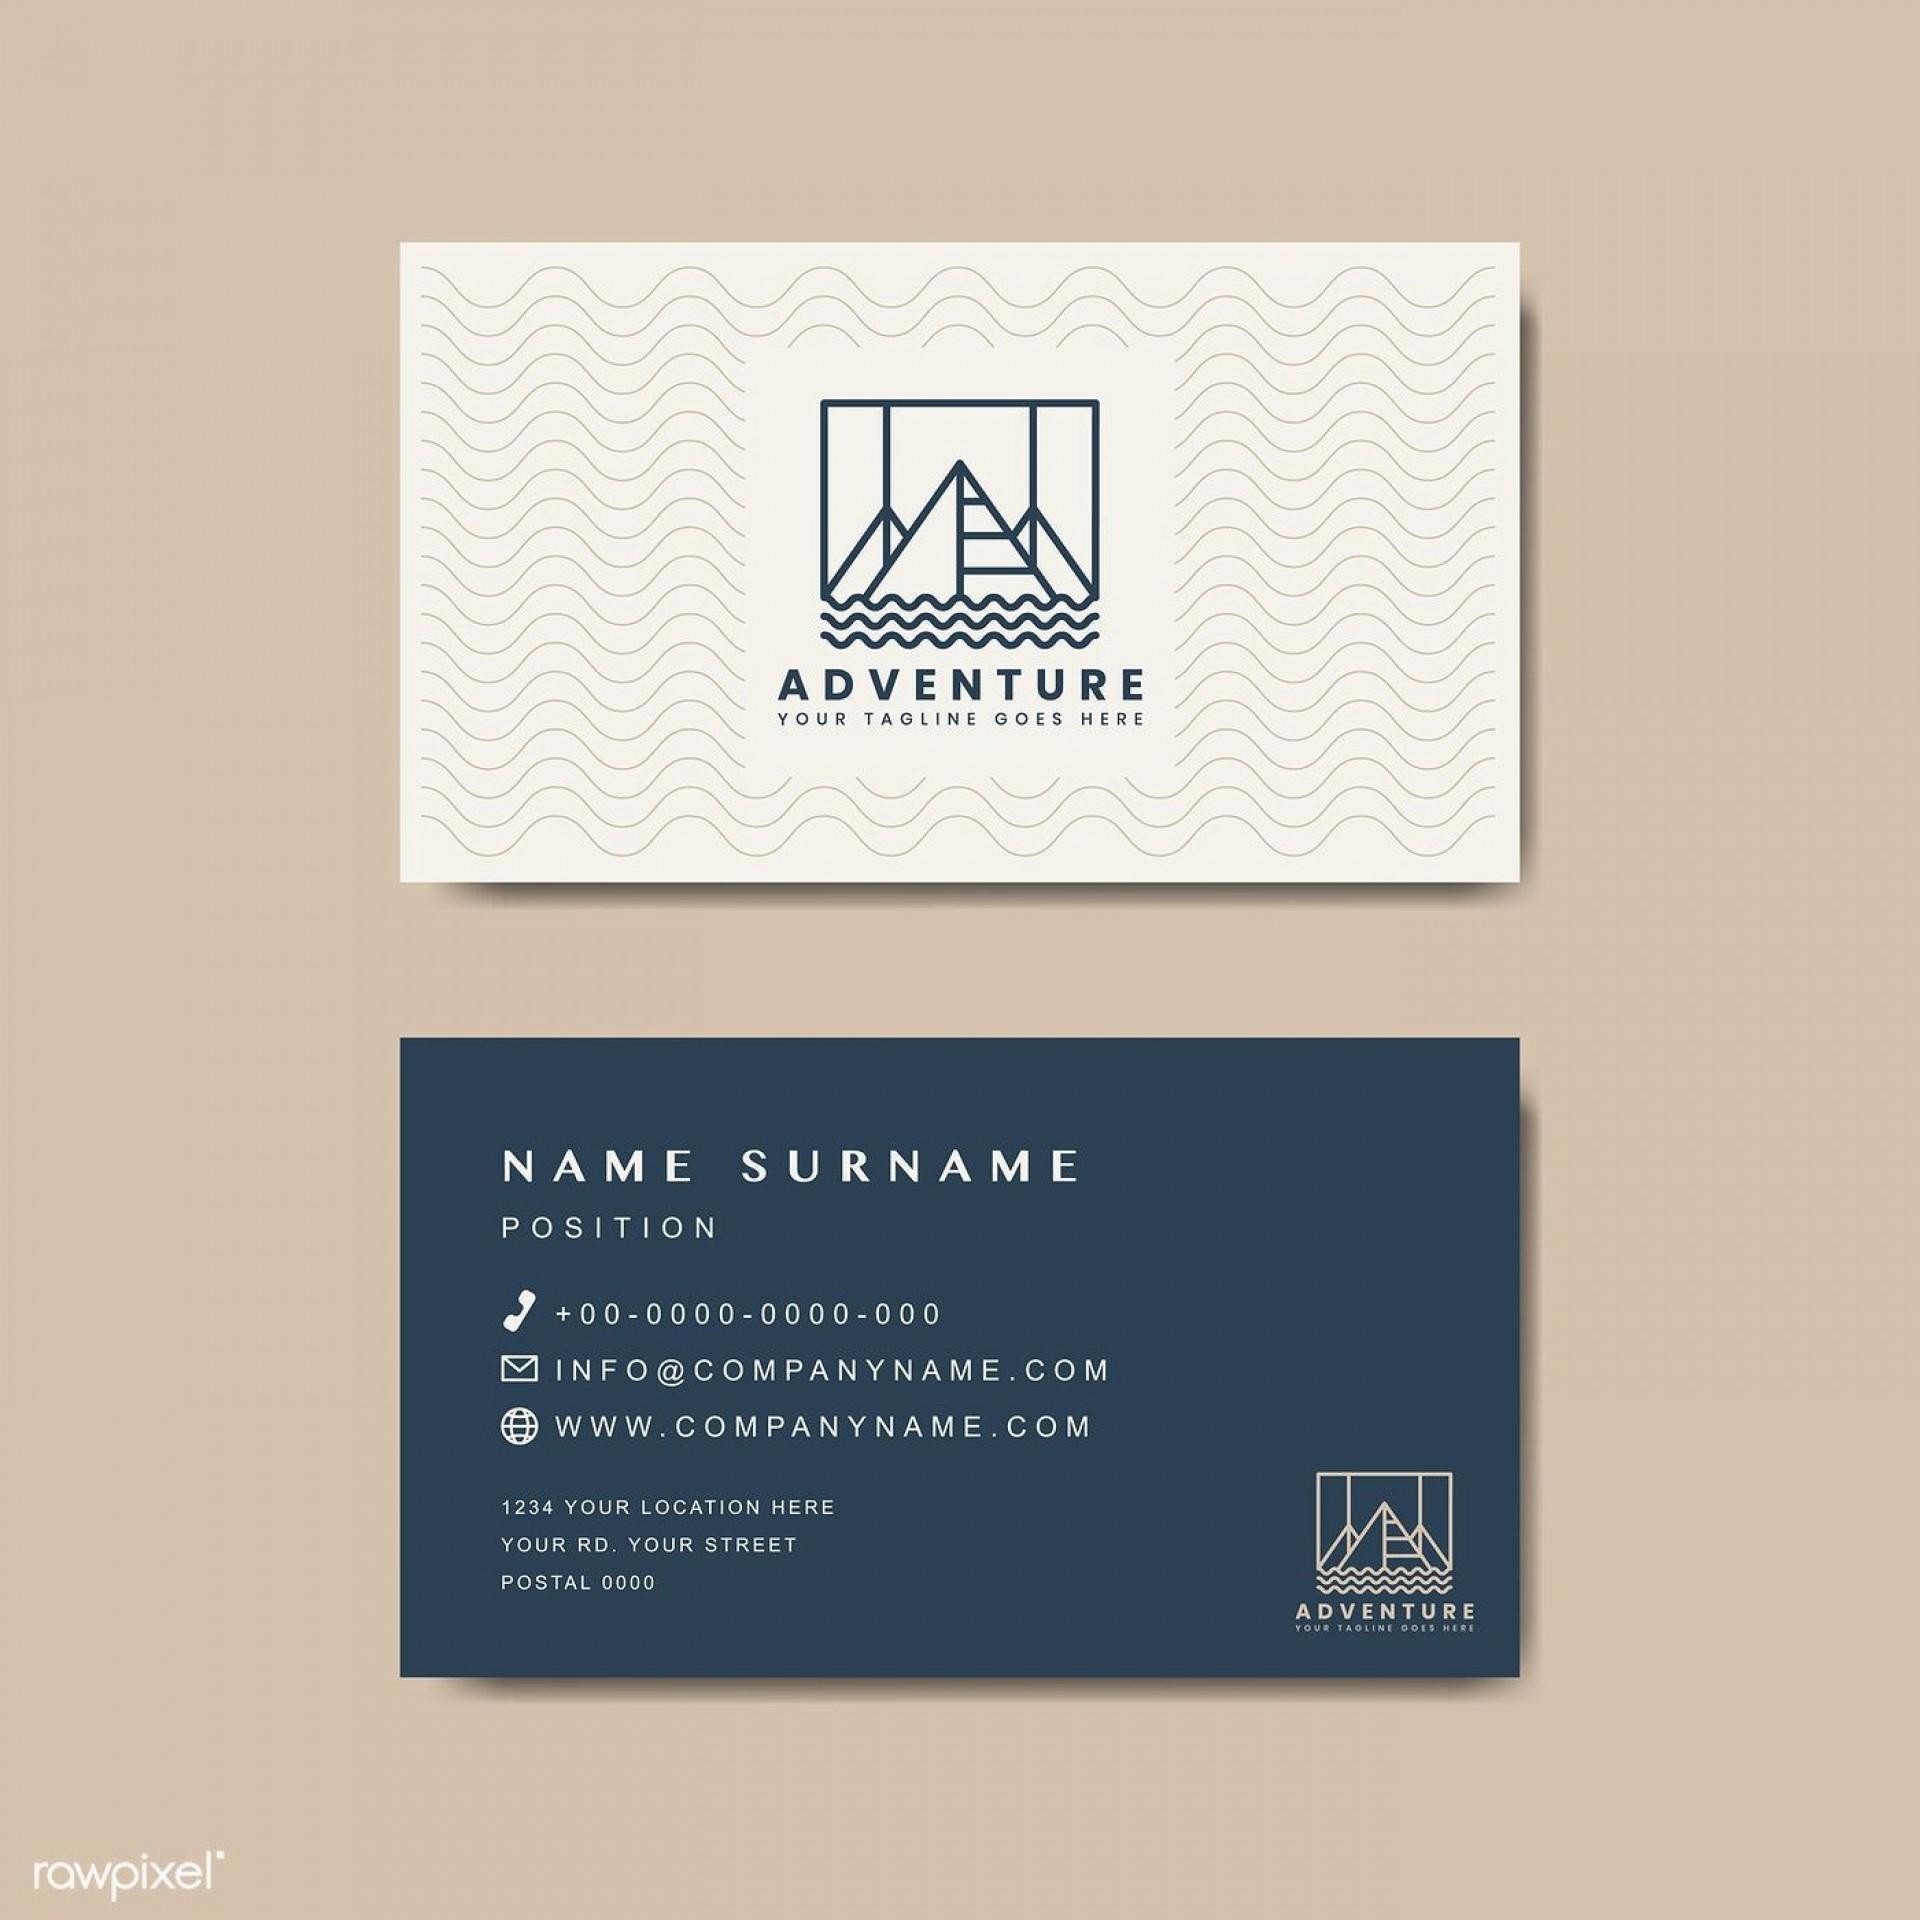 005 Simple Minimal Busines Card Template Free Download Picture  Design Coreldraw1920